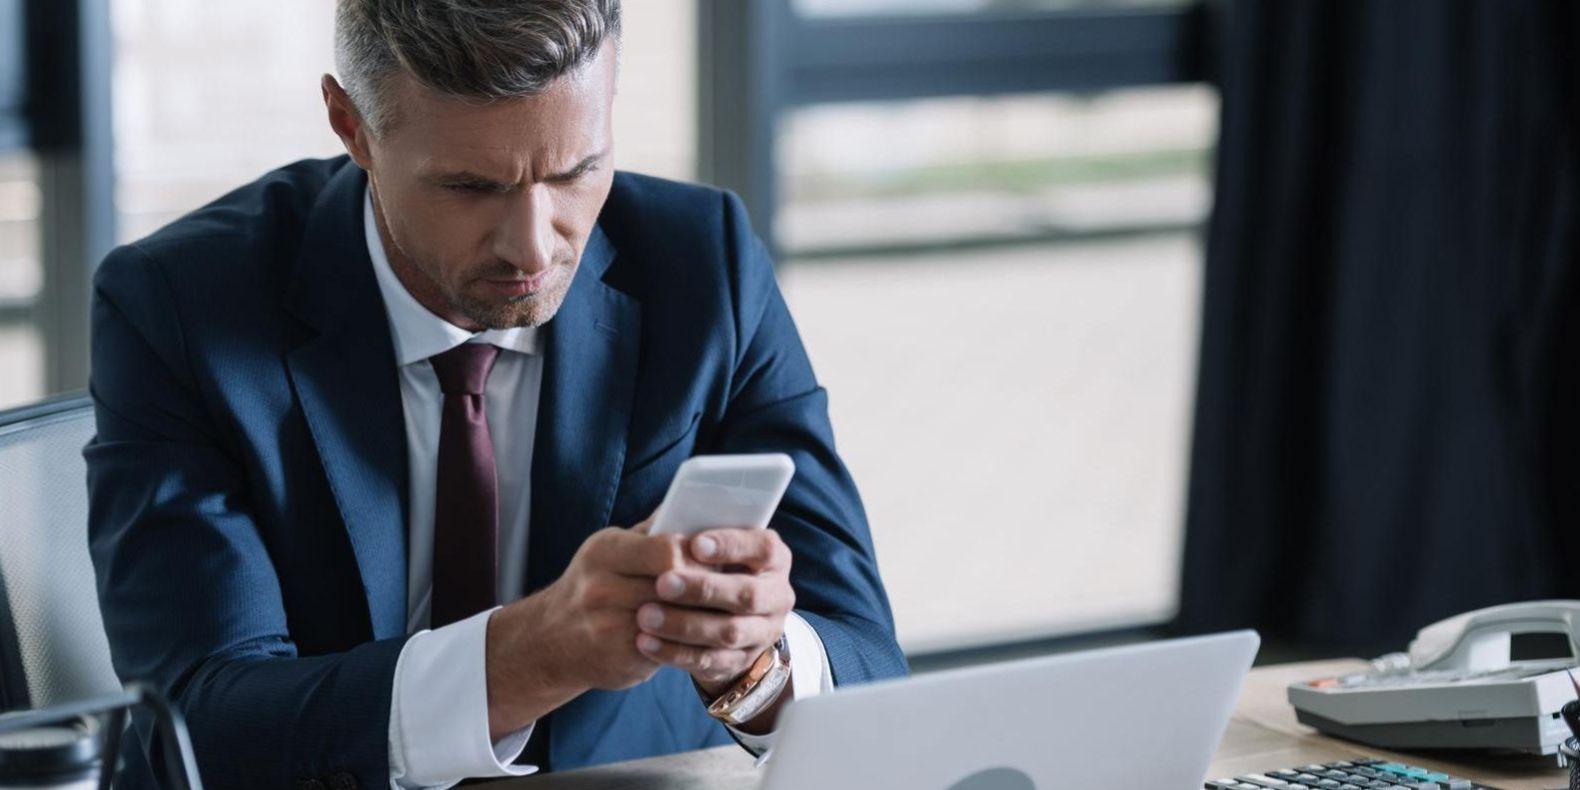 Erhöht digitaler Stress das Krankheitsrisiko?